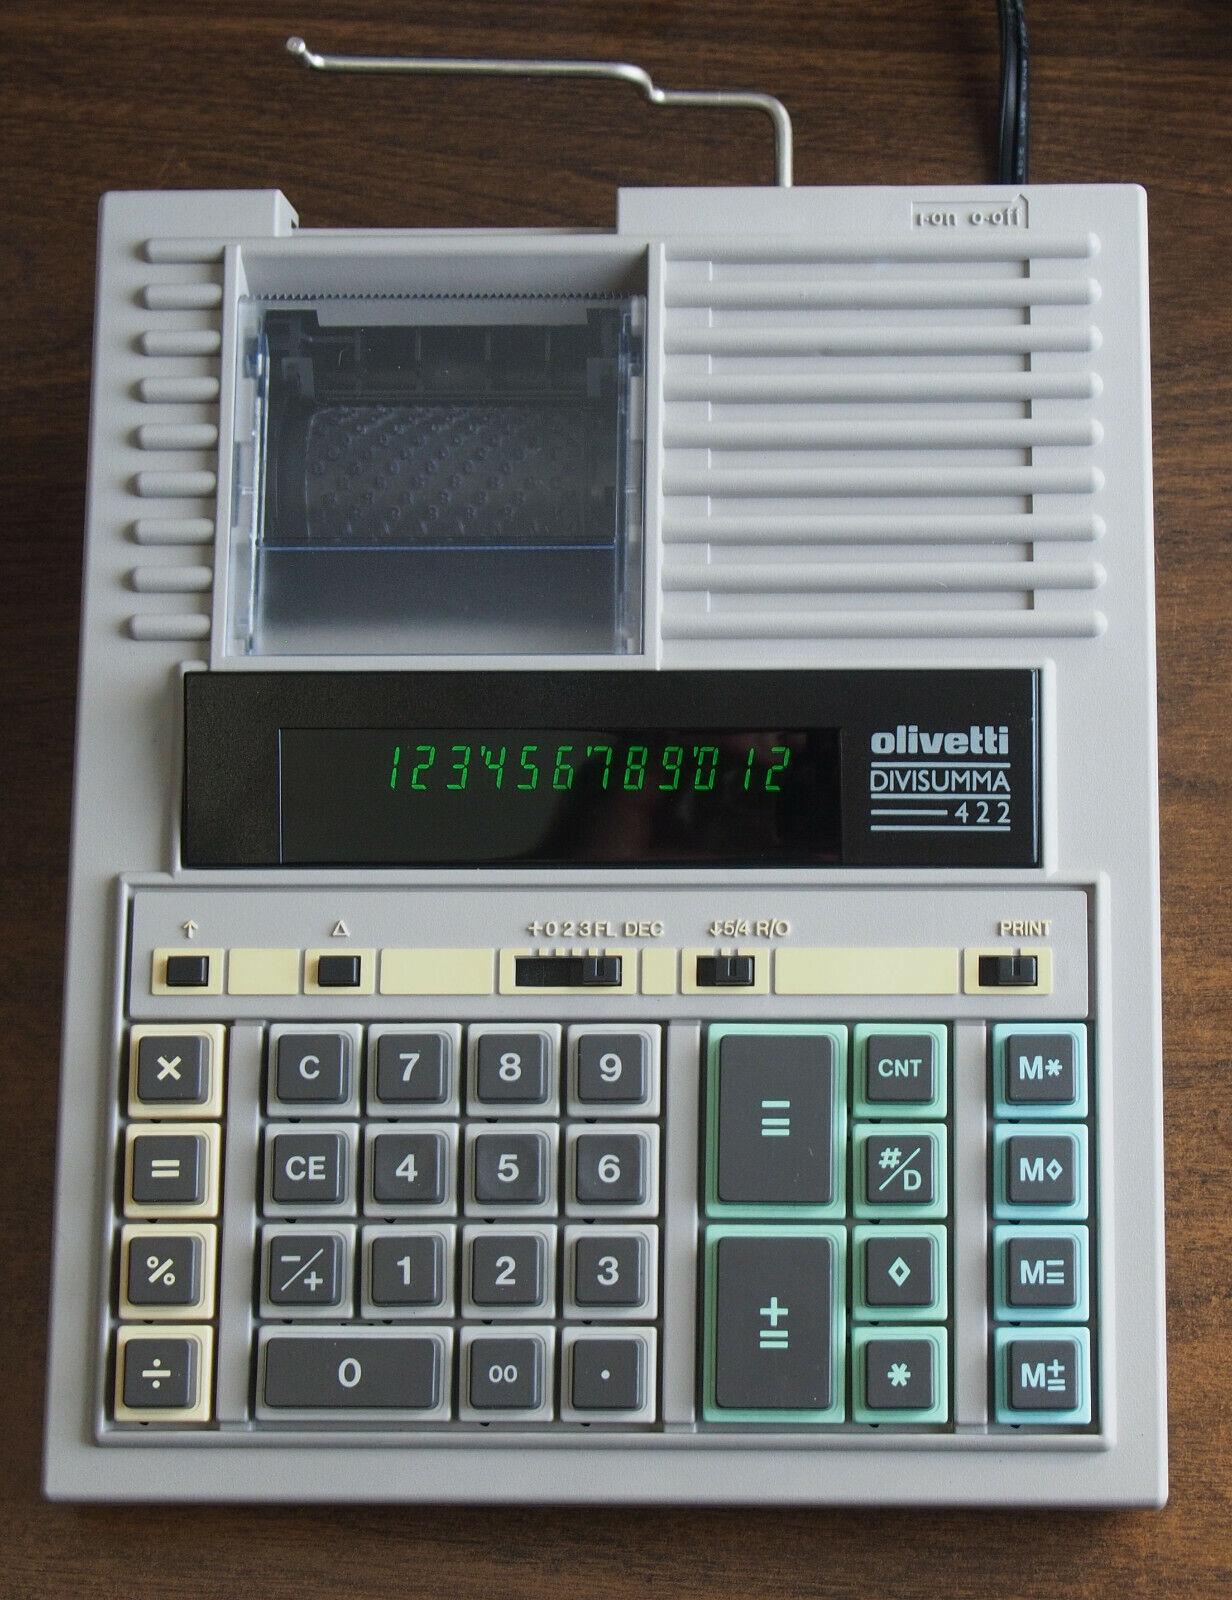 Olivetti Divisumma 422 Electronic Printing Calculator - Tested